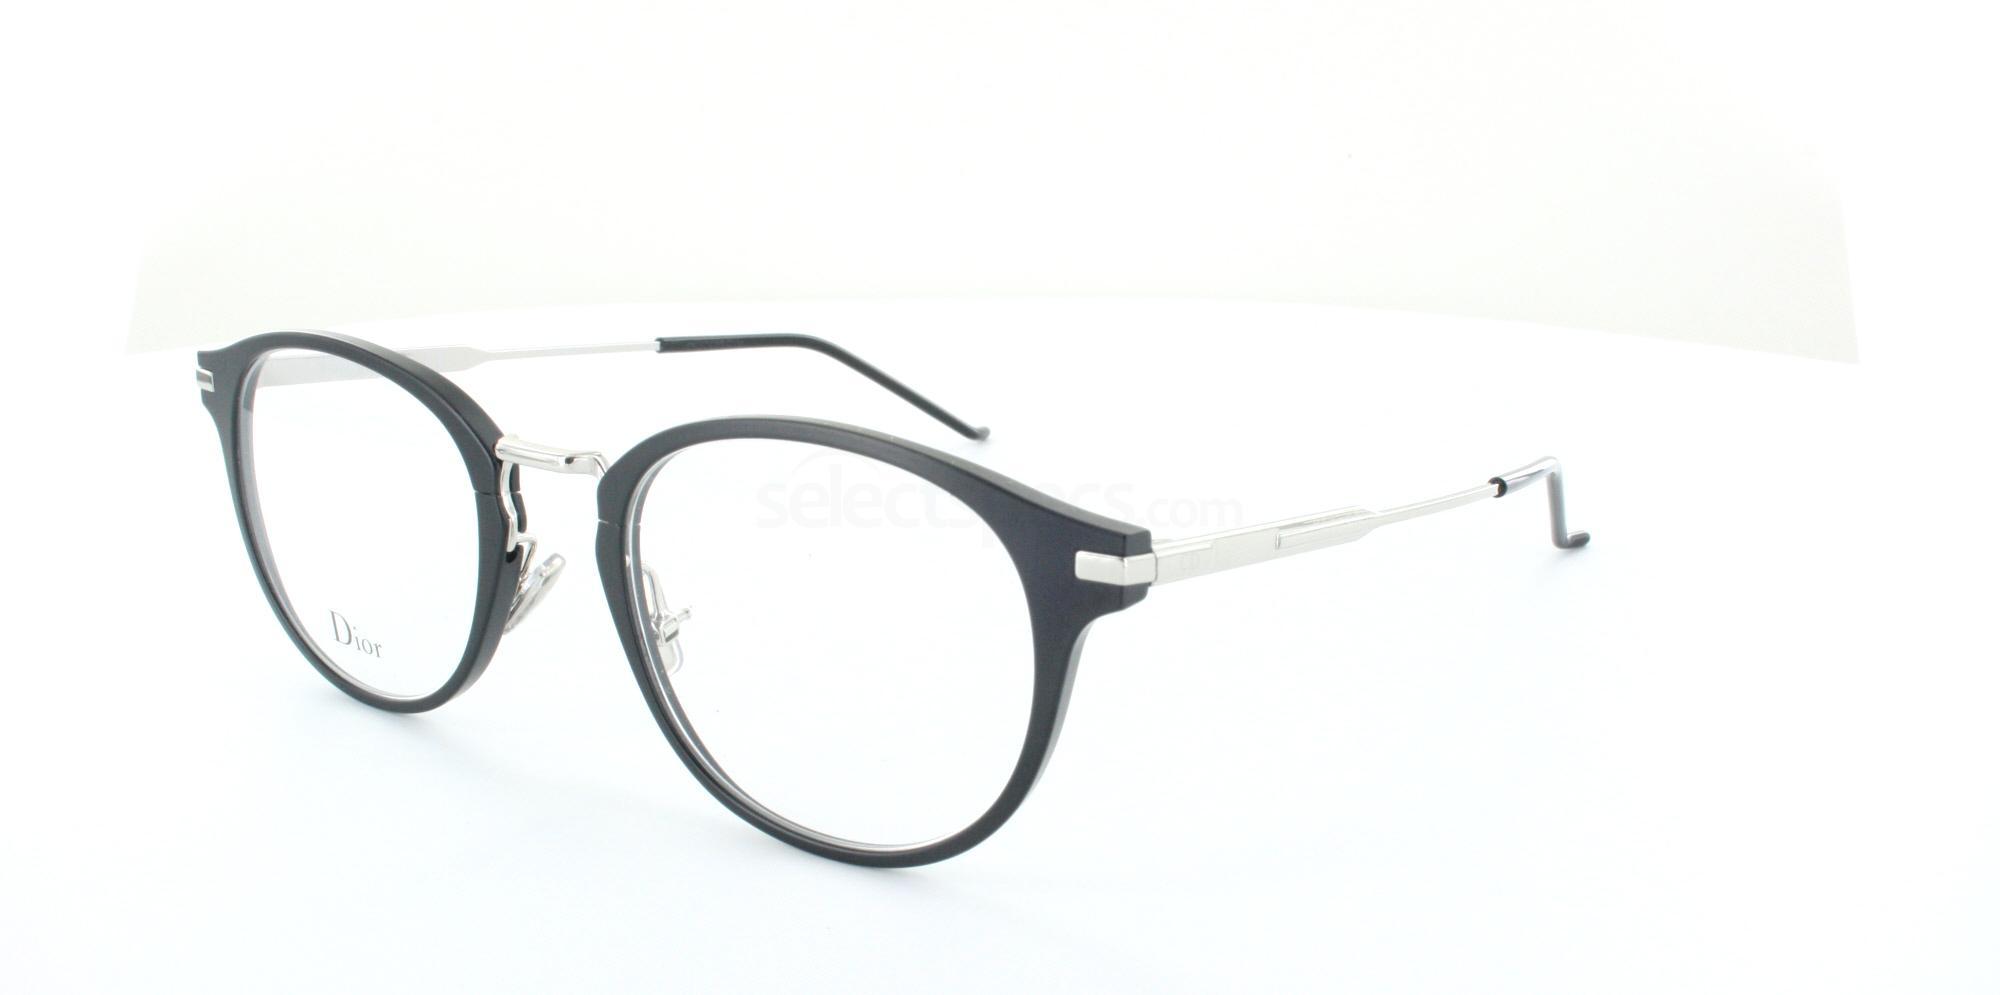 P5I AL13.12O Glasses, Dior Homme